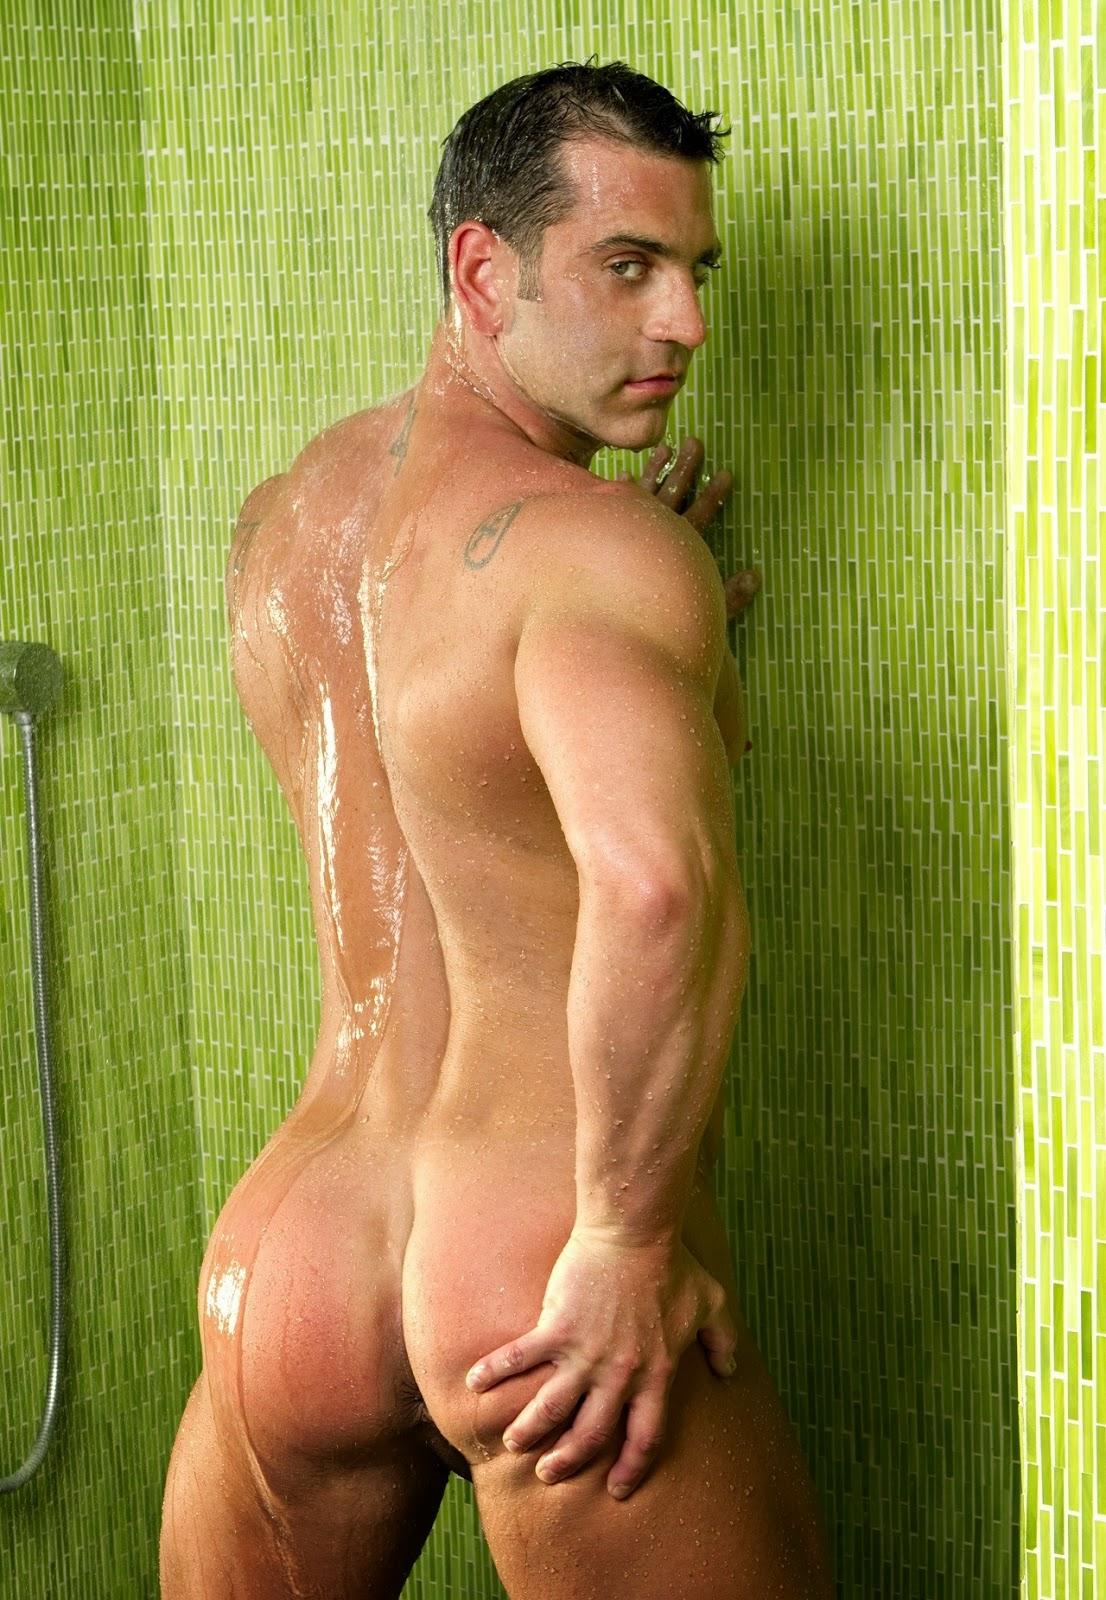 http://www.imagebam.com/gallery/trwxajhcgdx1arry2r2bp2sdeqr5dv97